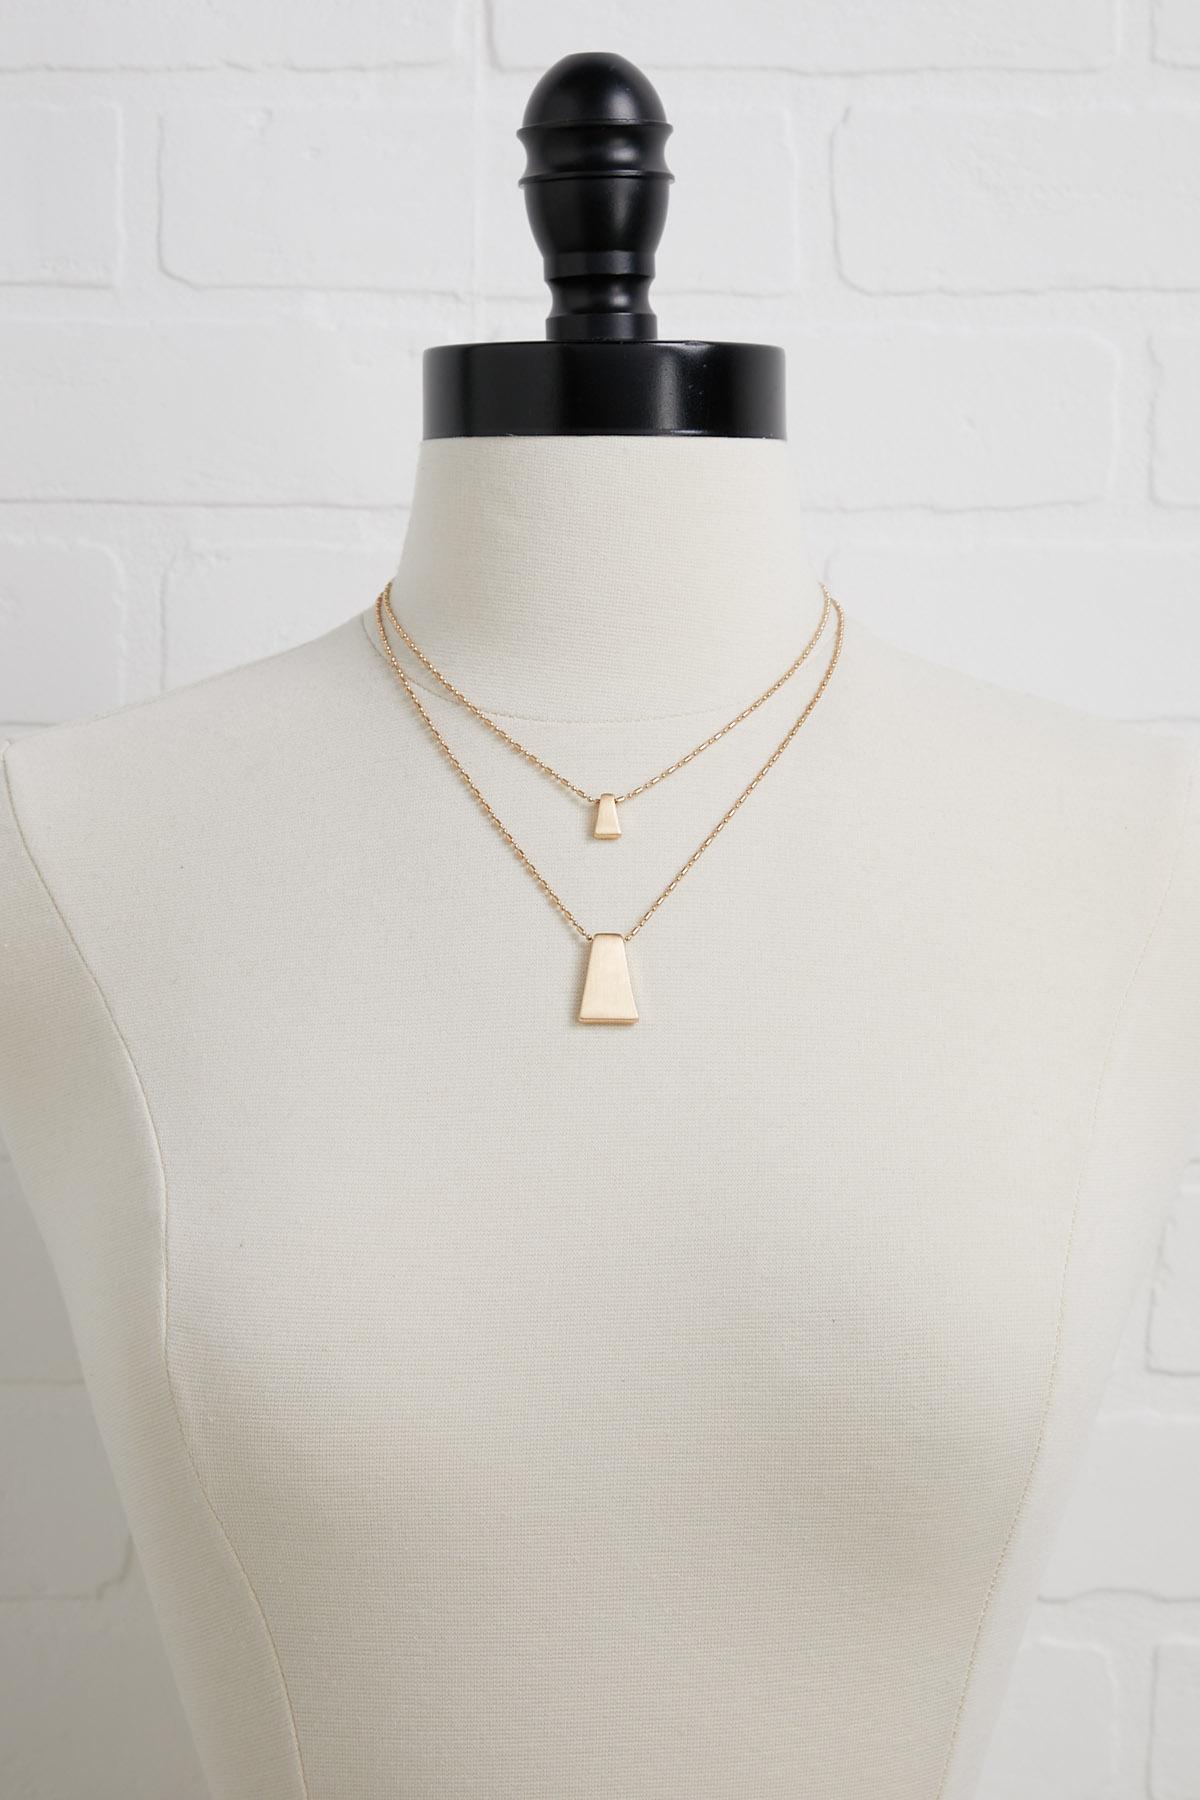 Brushed Dainty Necklace